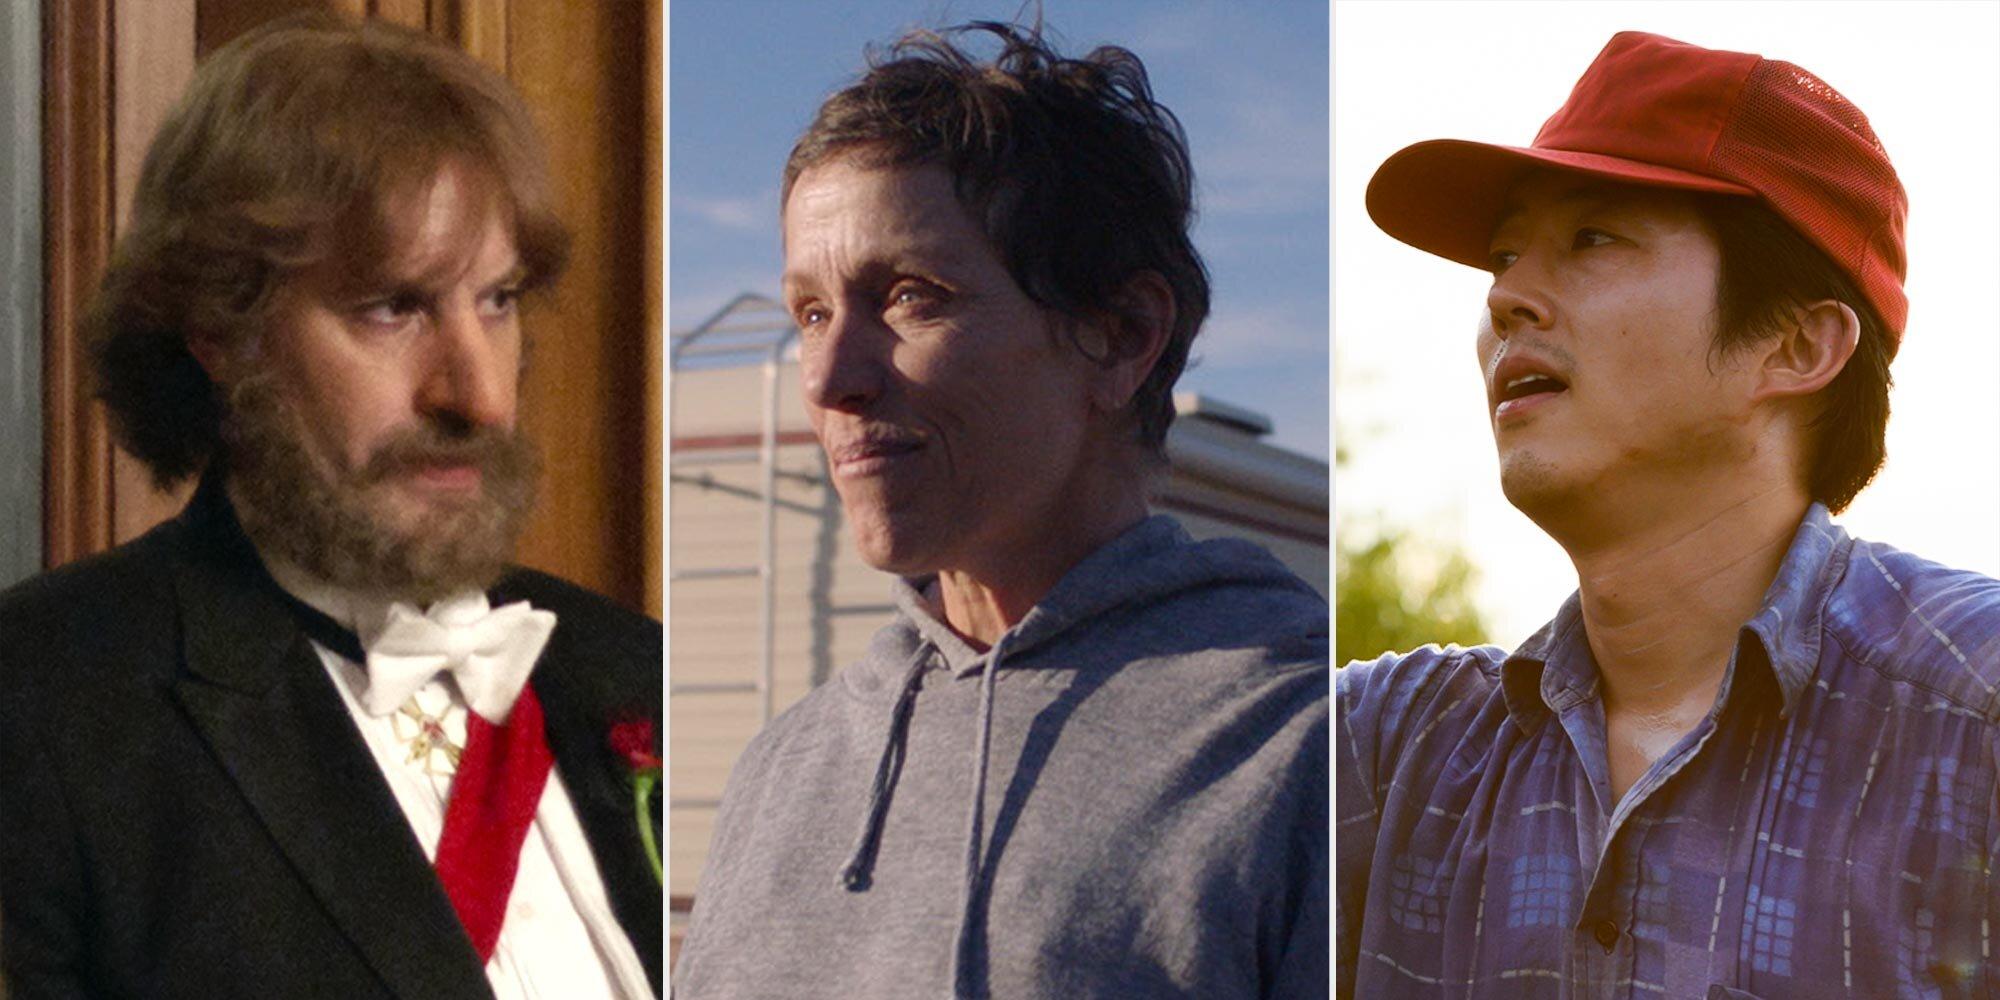 'Borat' shocks Best Picture Oscar race as producers guild unveils best films of the year